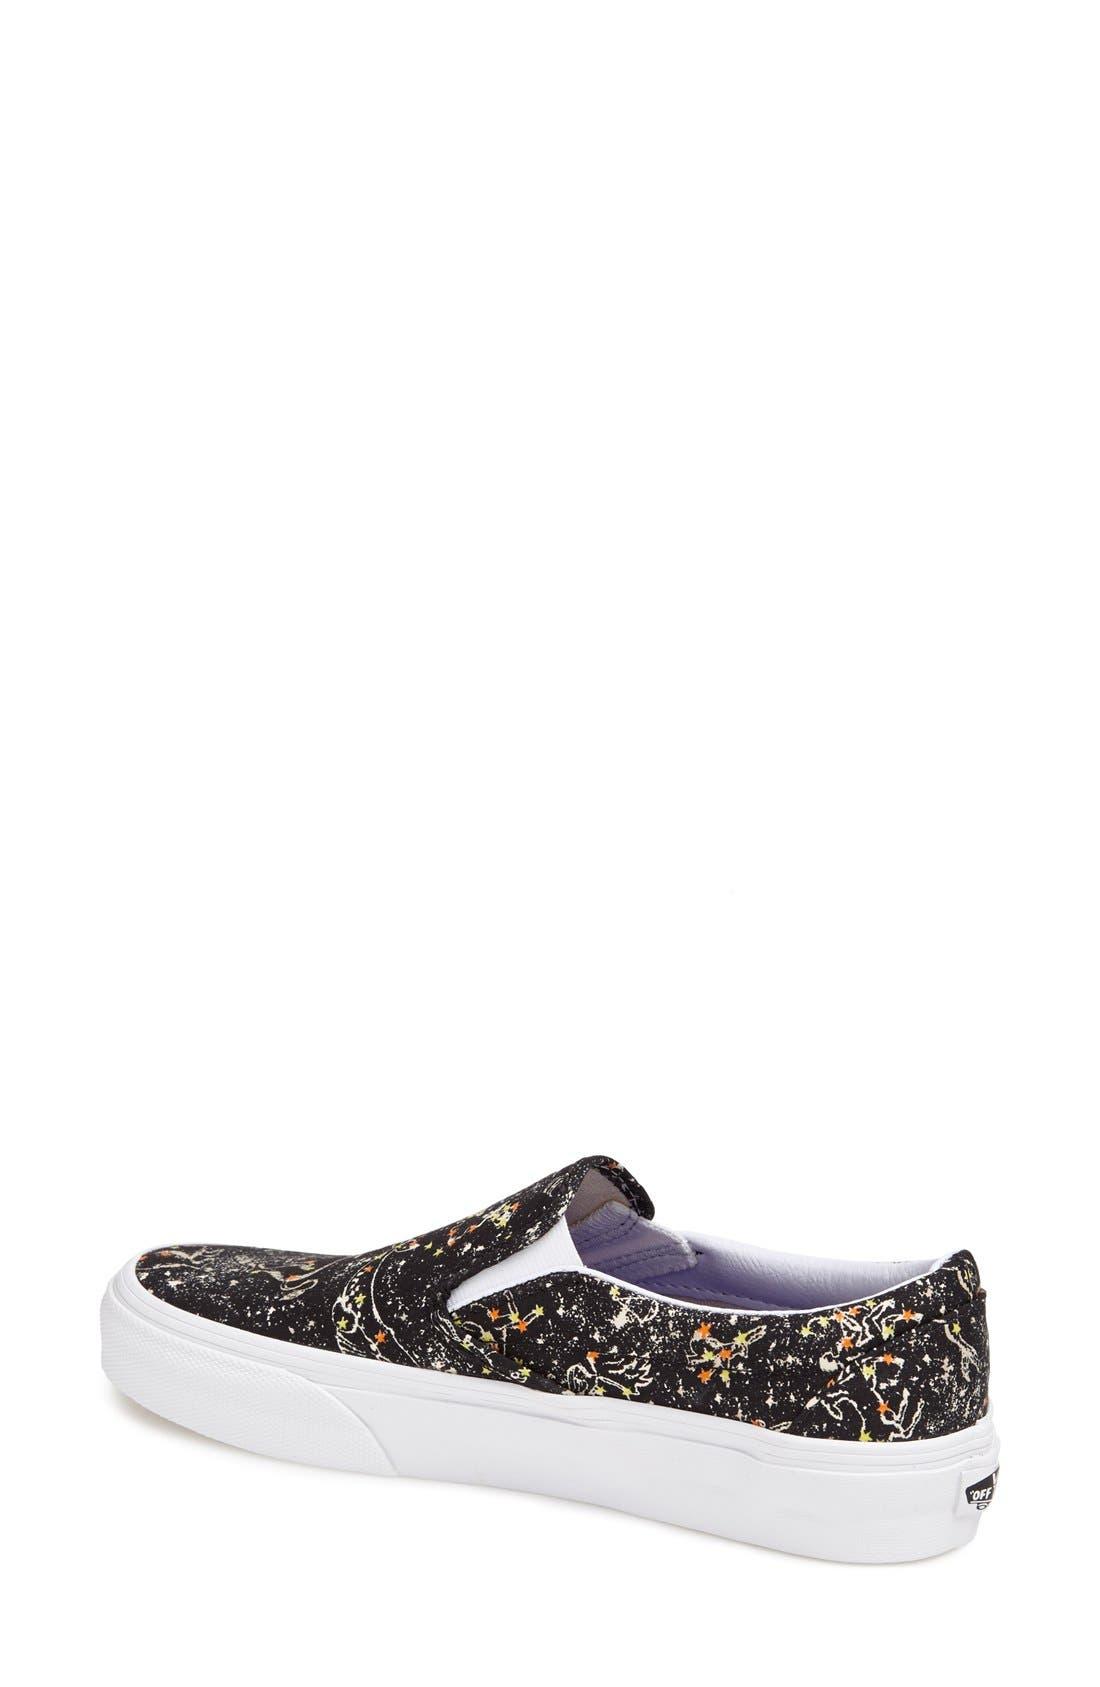 Alternate Image 2  - Liberty x Vans 'Classic' Slip-On Sneaker (Women)